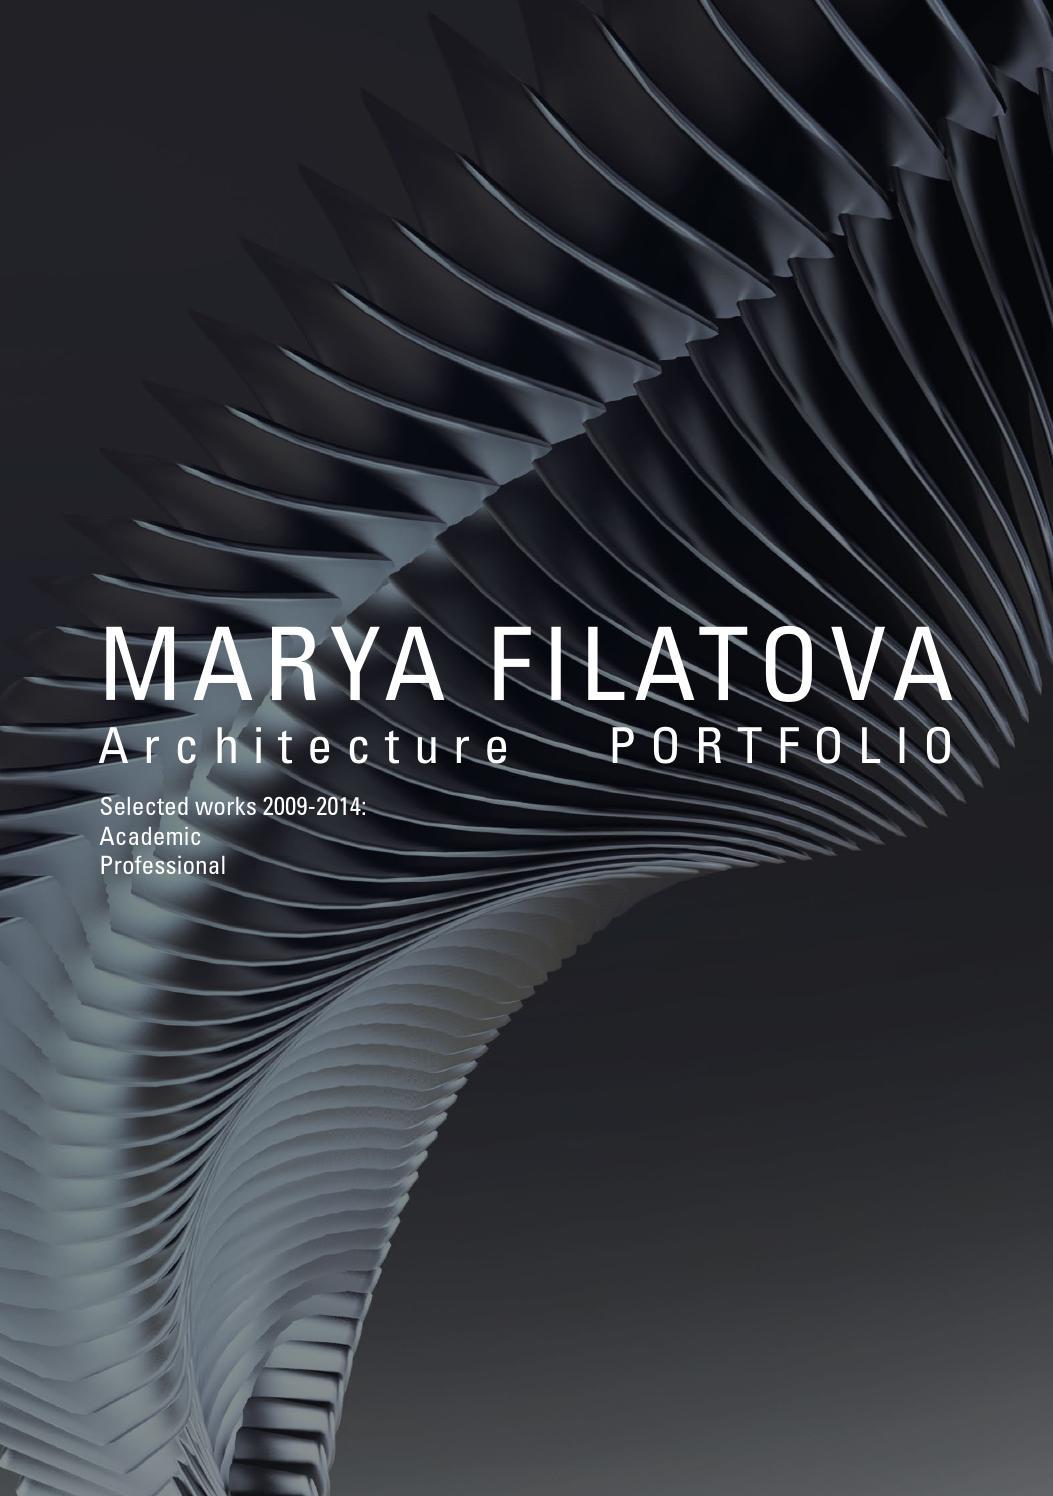 Architecture Portfolio By Mar'ya Filatova Issuu